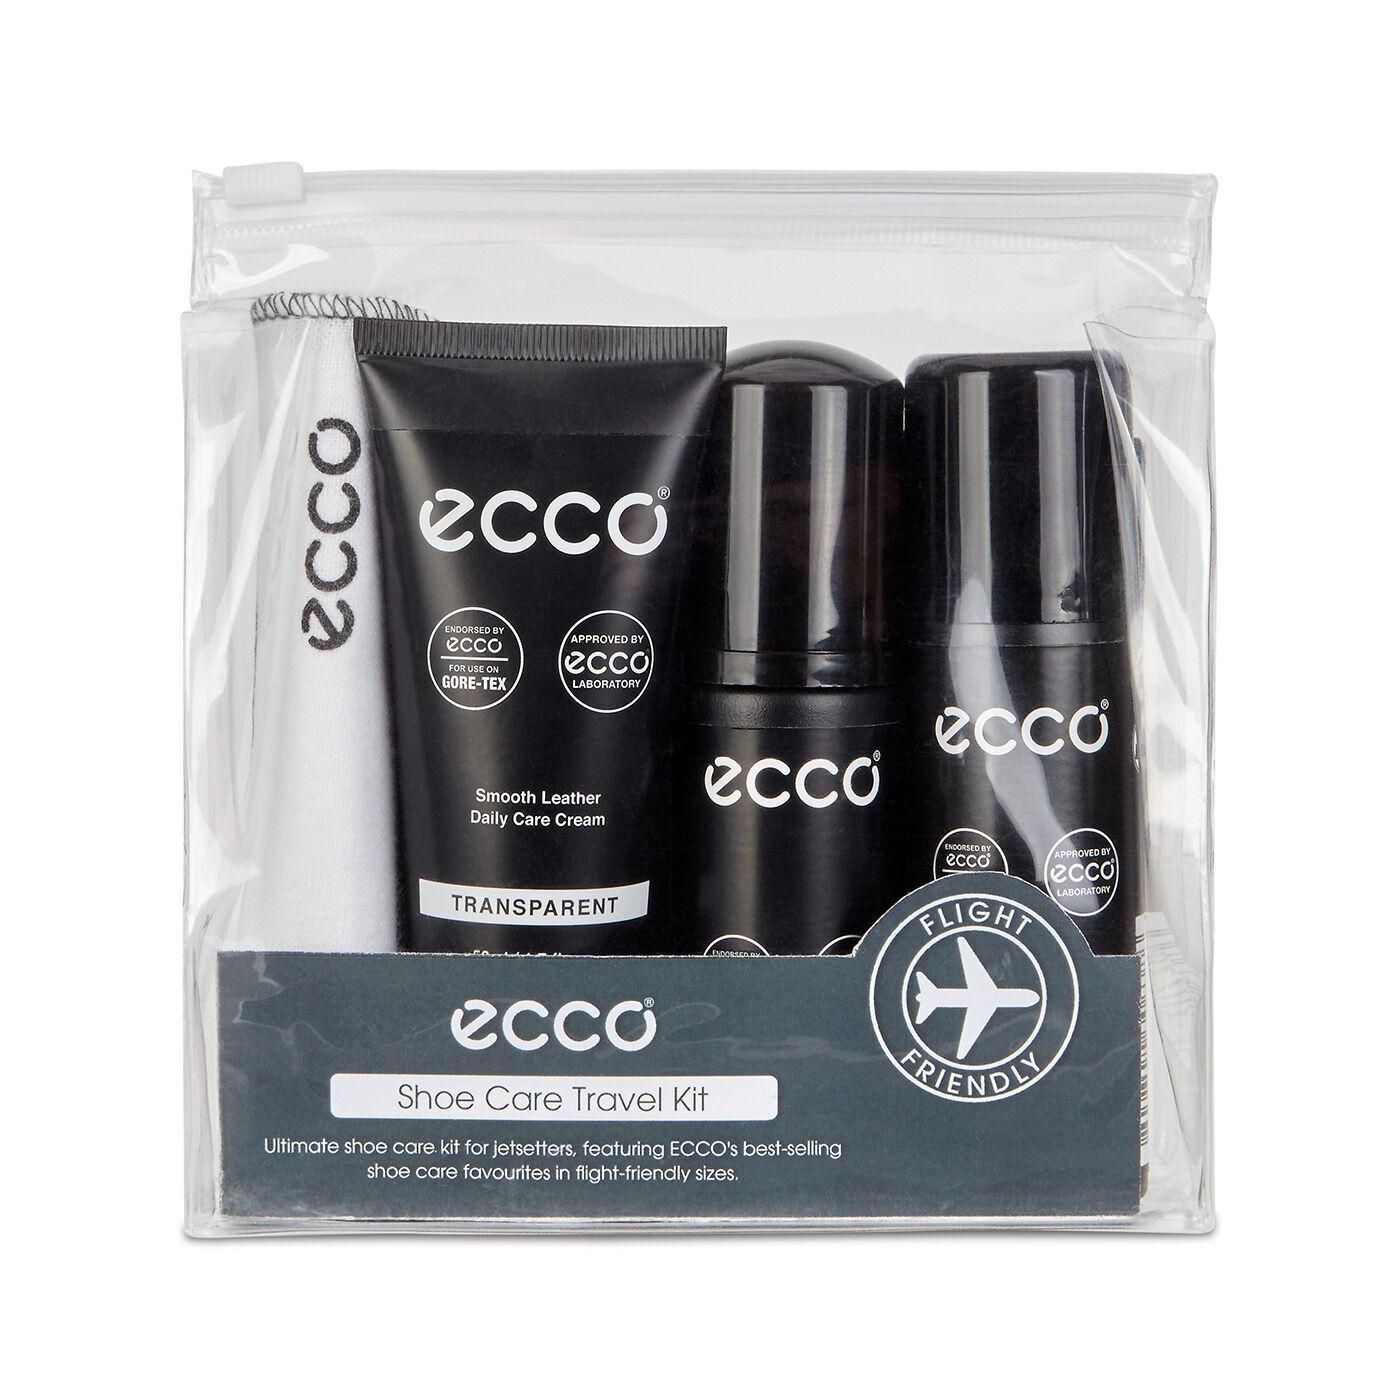 ECCO Shoe Care Travel Kit: One Size - Transparent